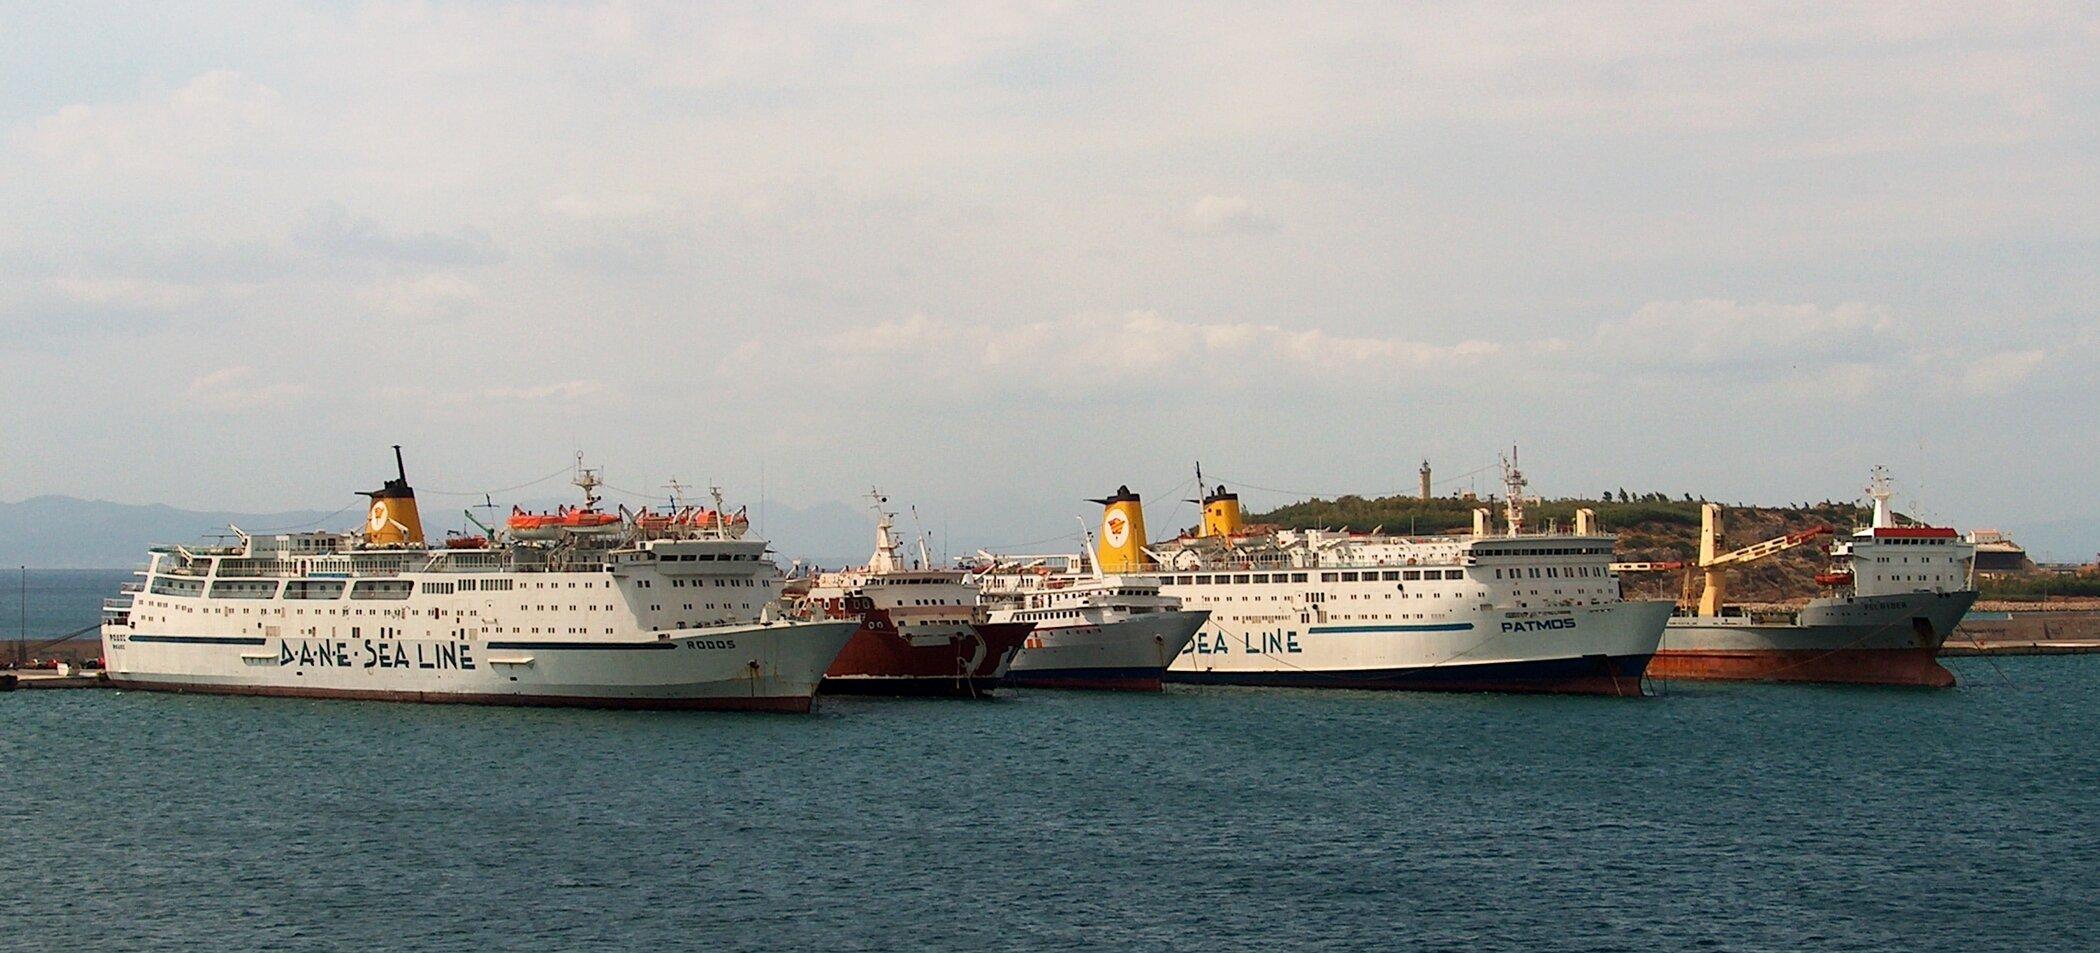 Rodos & Patmos @ ΝΜΔ, Sept 2004